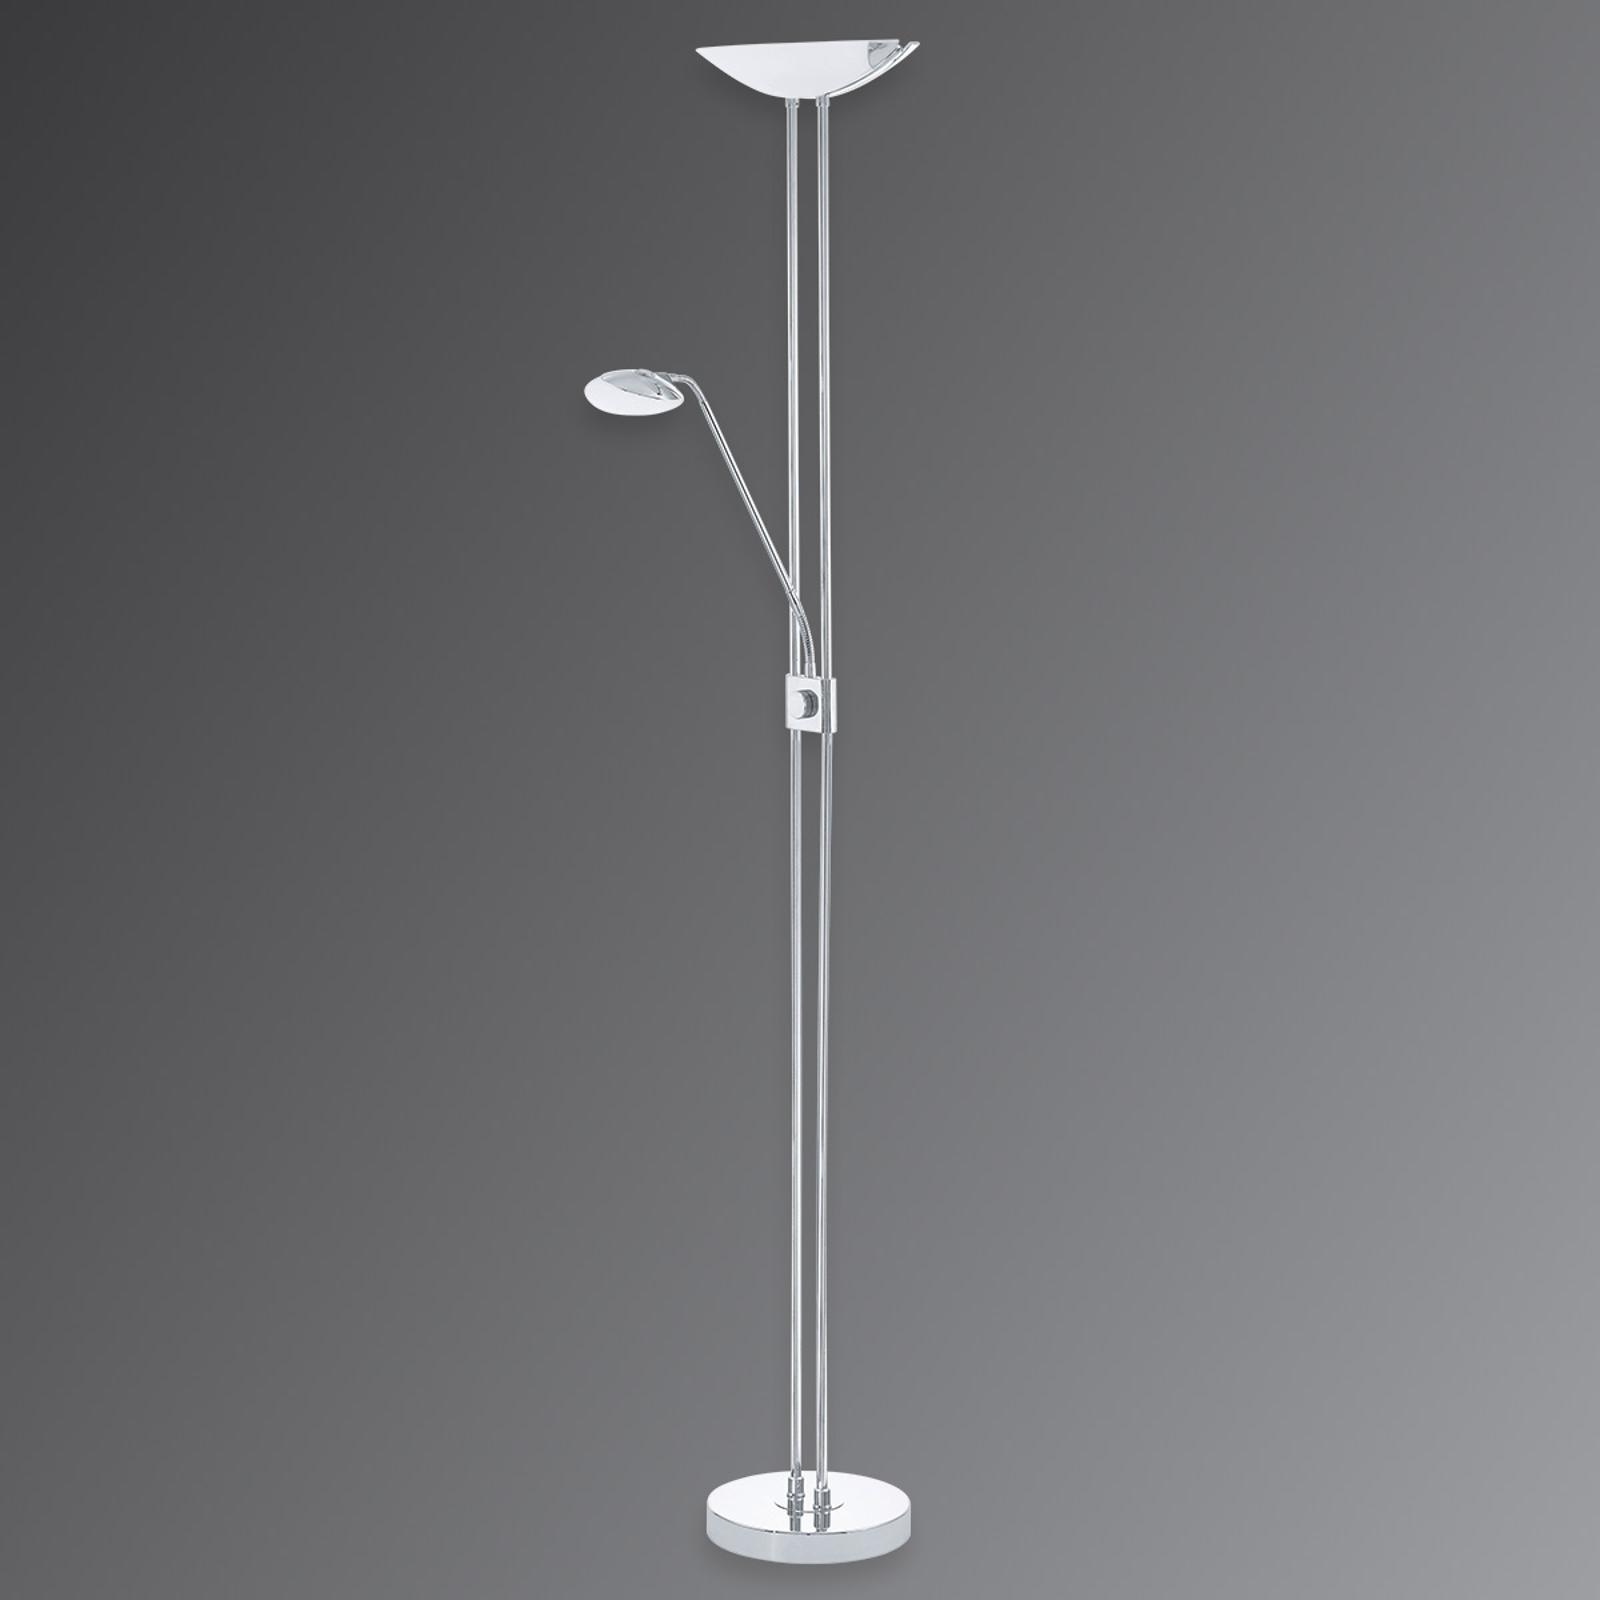 Baya - verchr. LED opwaartse plafondlamp leeslamp